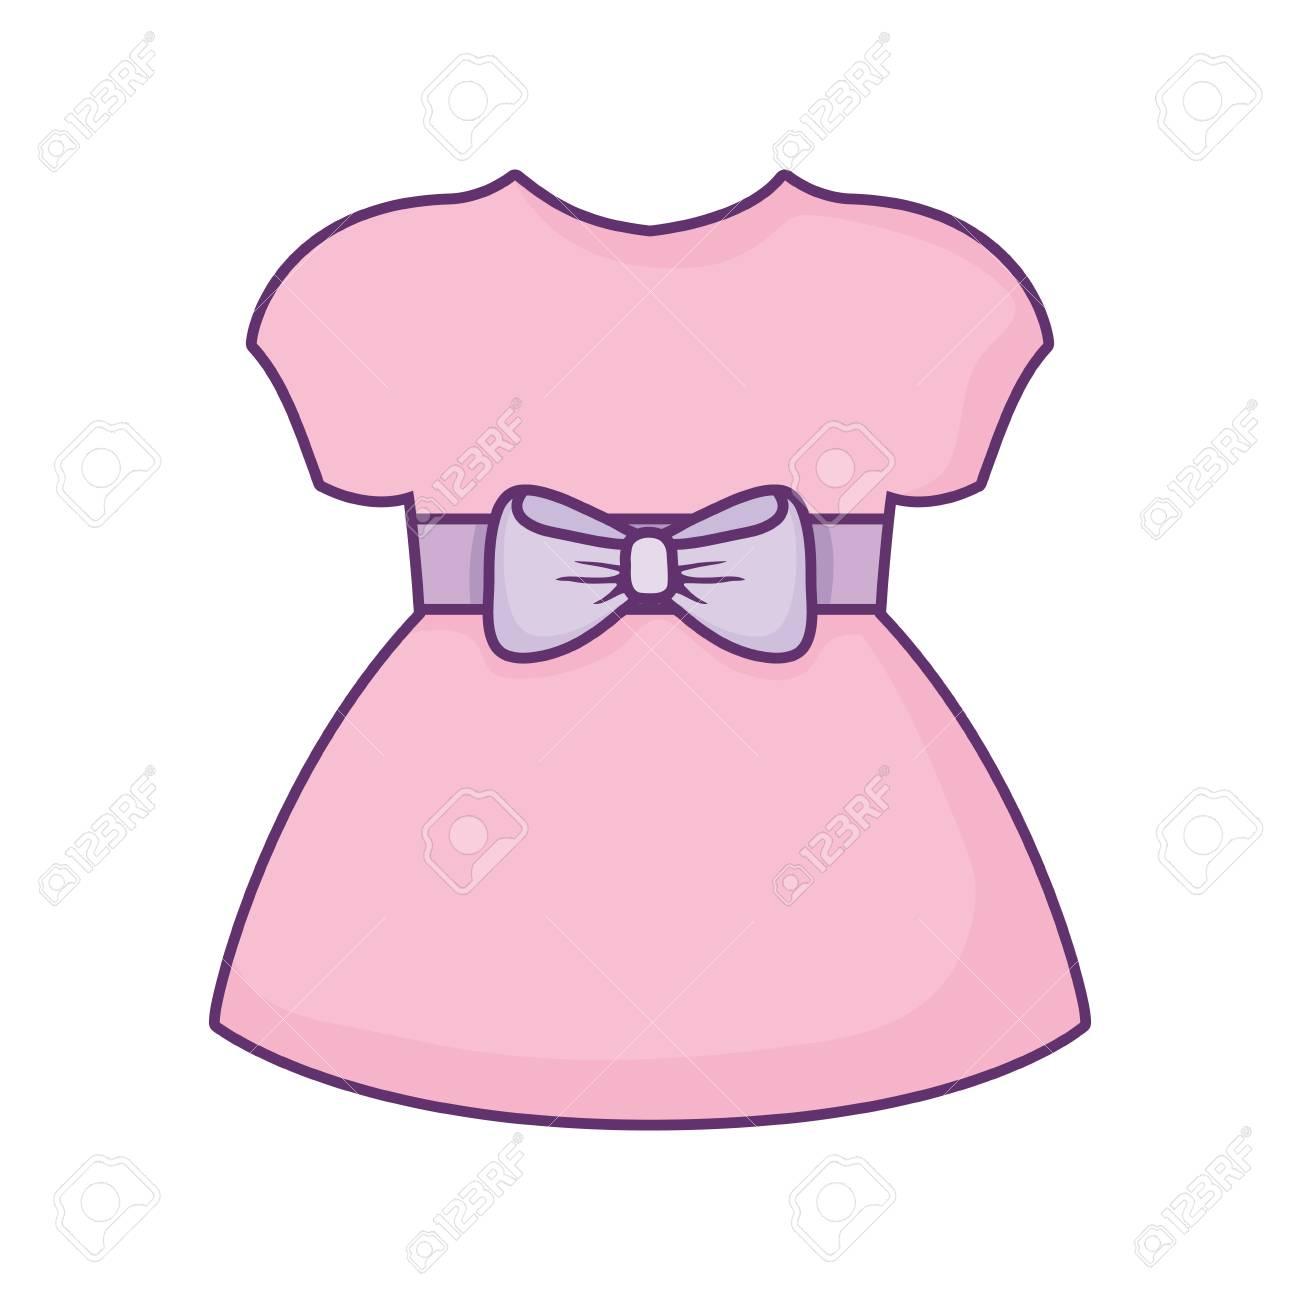 baby girl dress icon over white background, vector illustration.